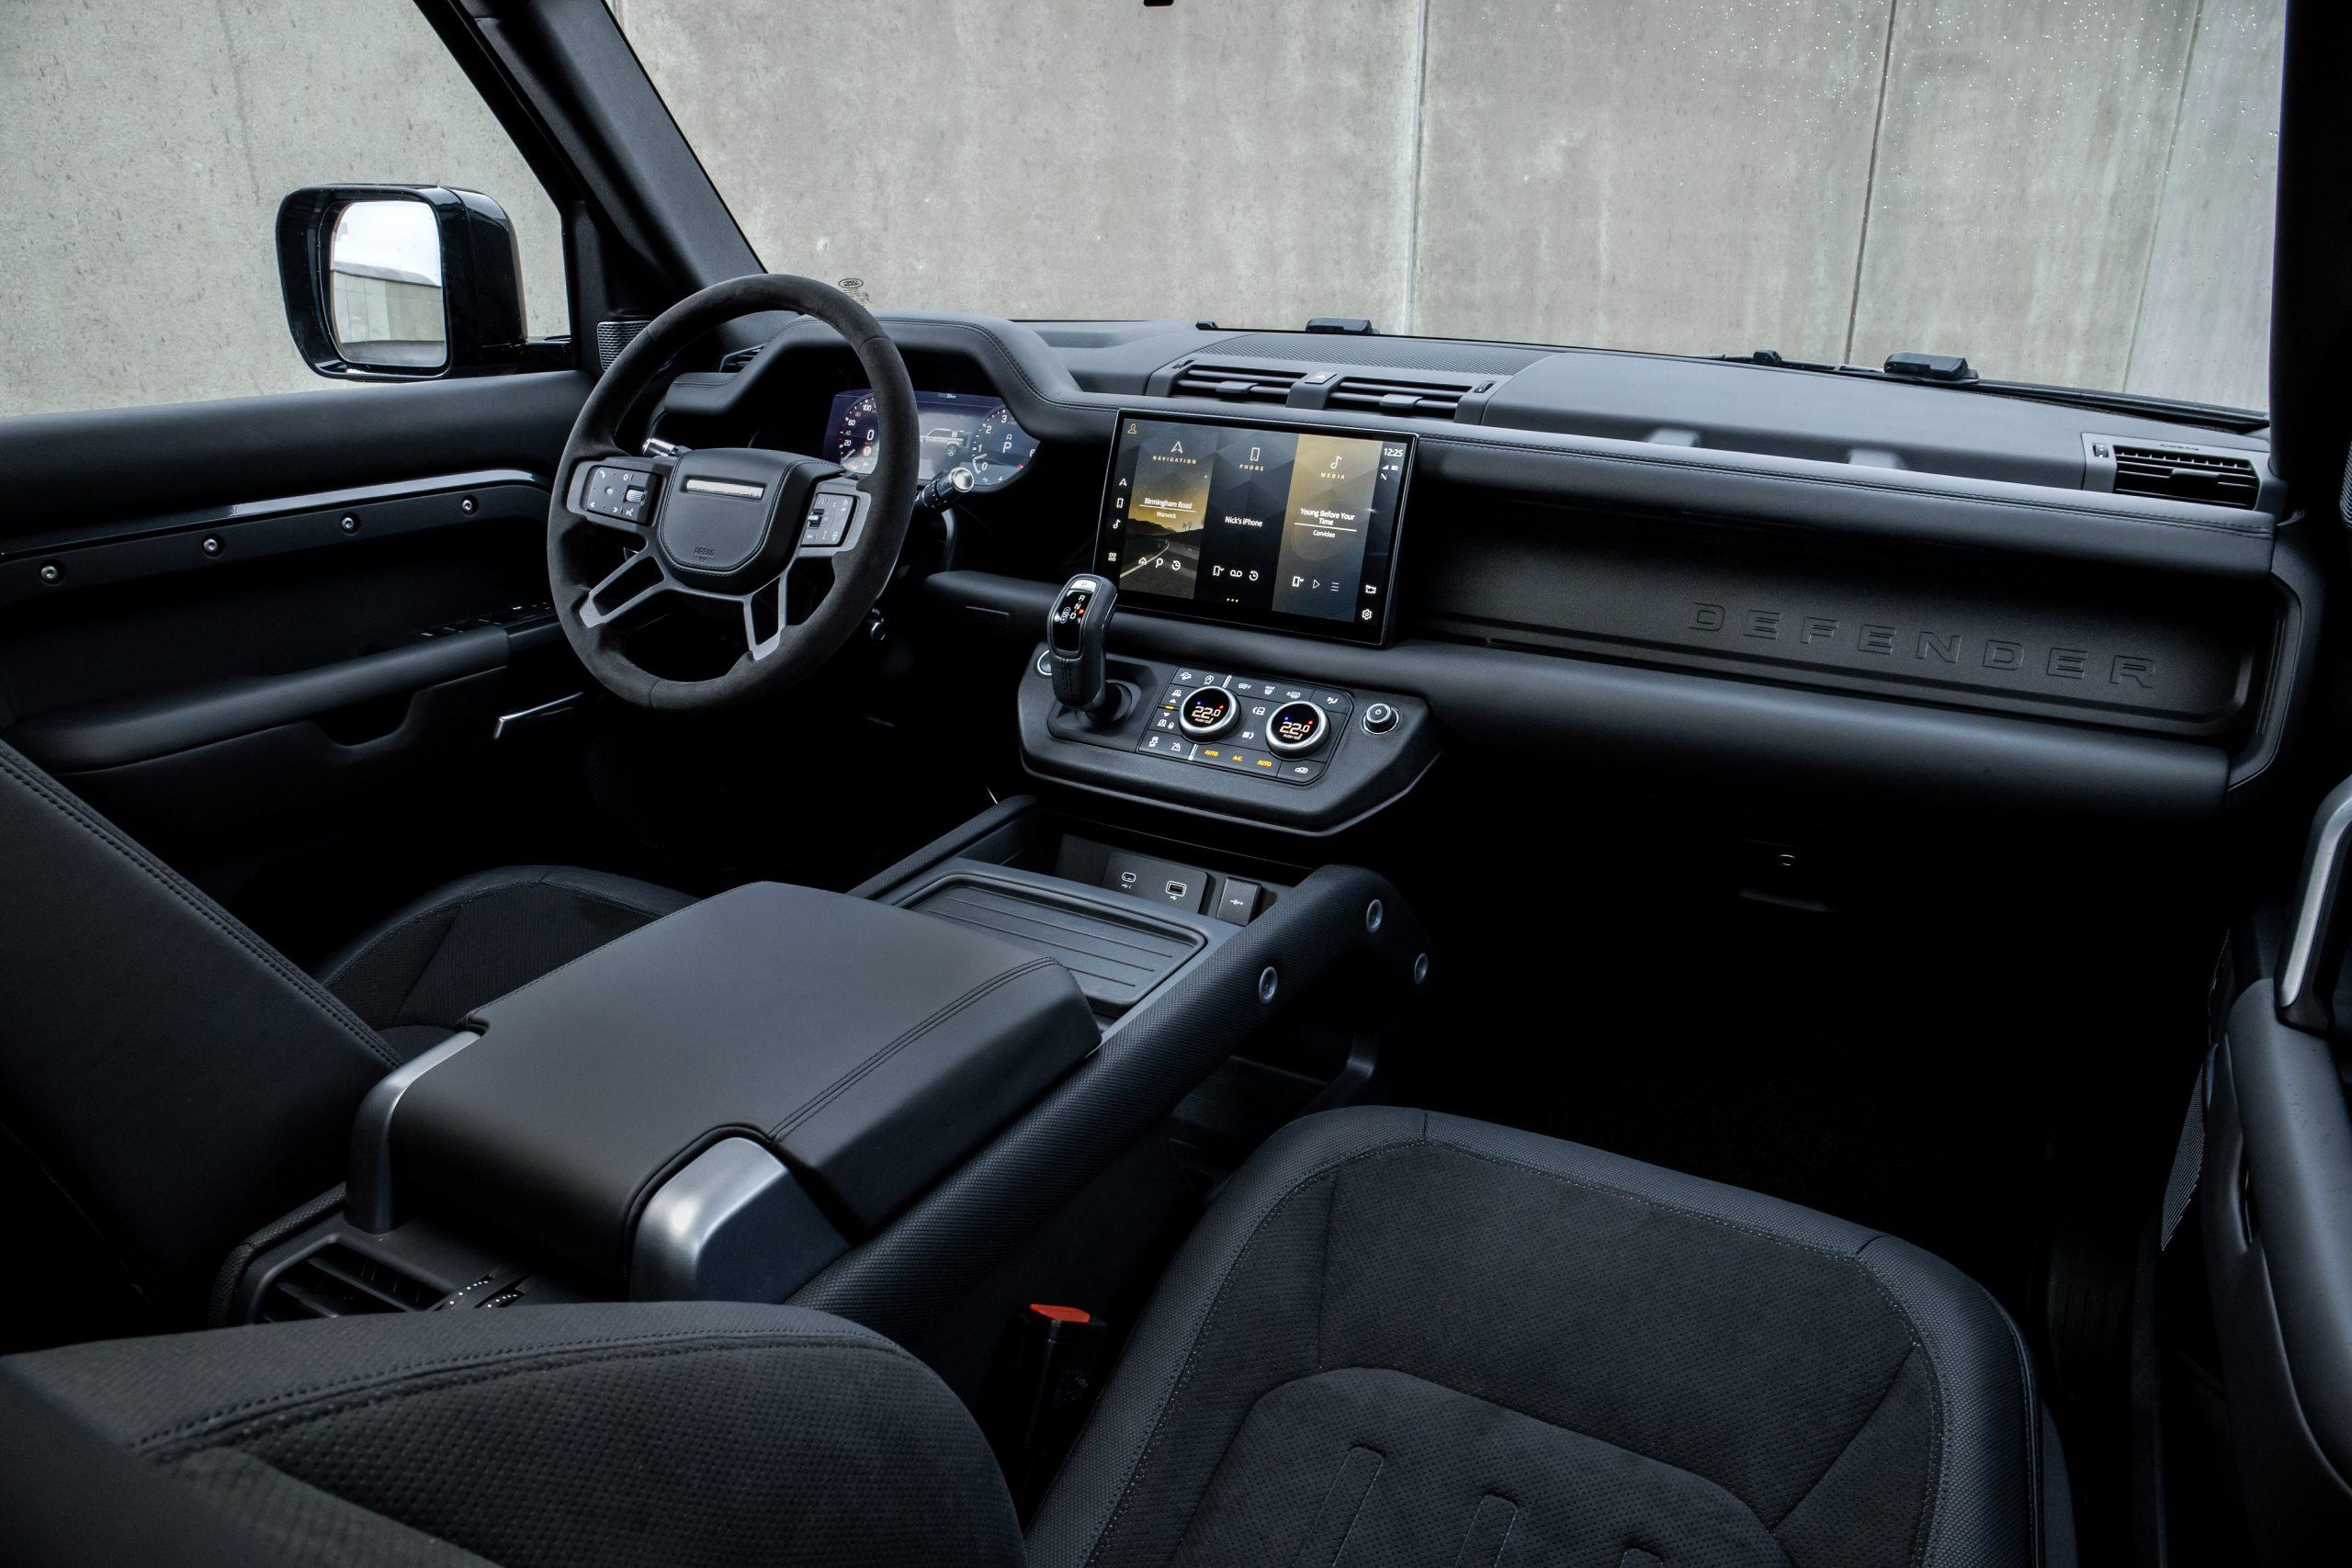 2022 Land Rover Defender interior